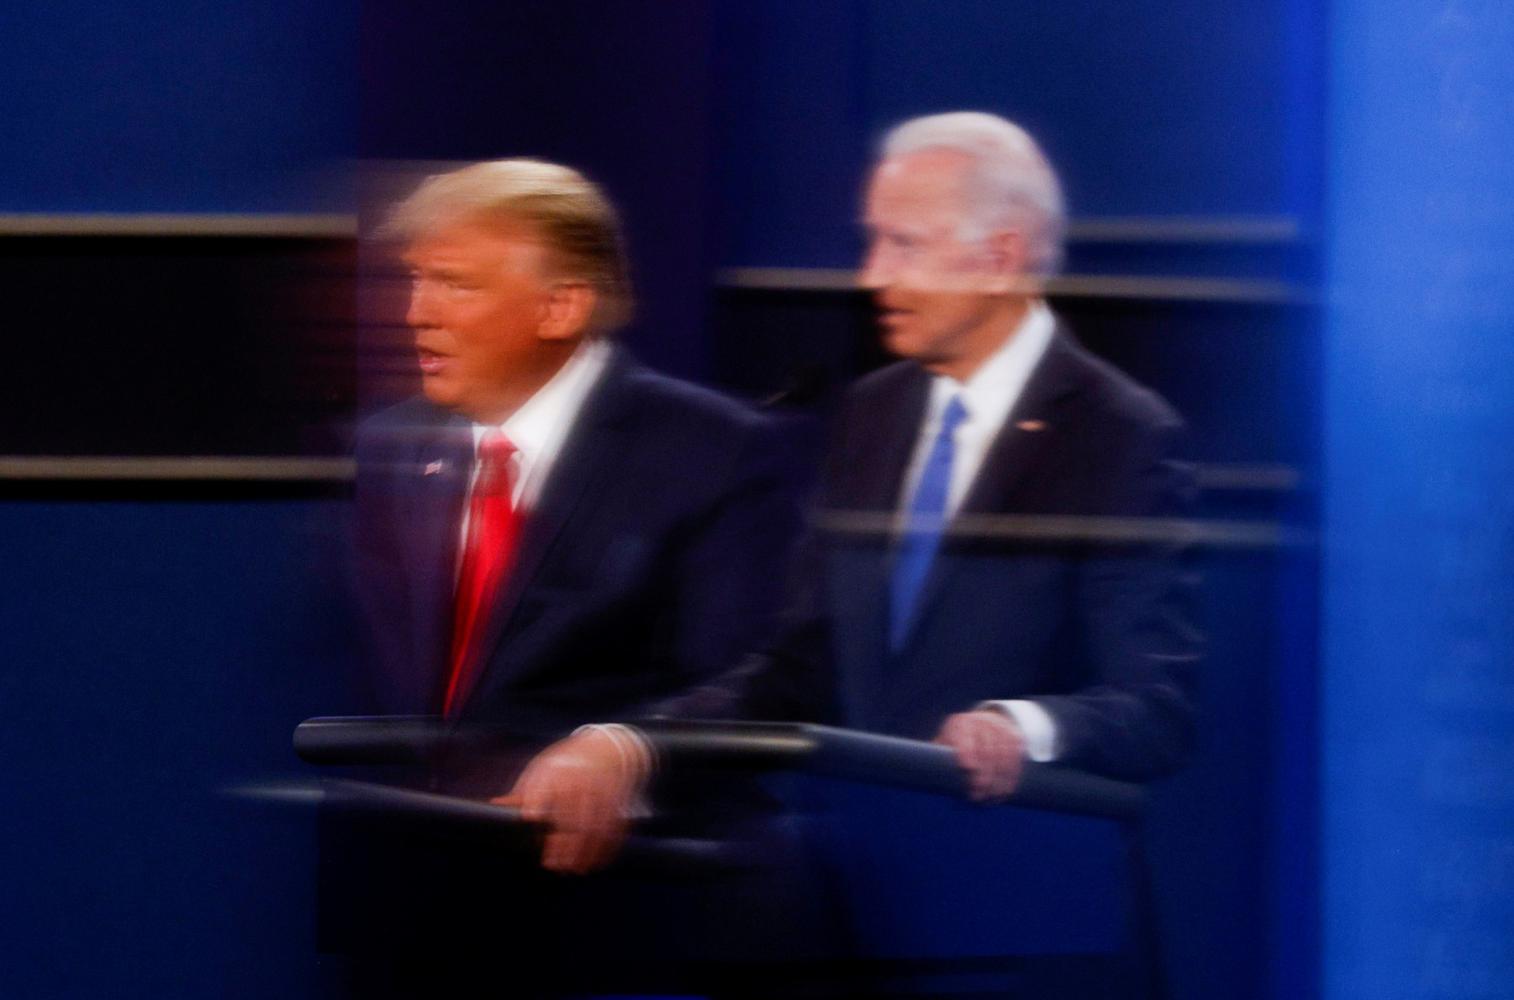 USA-ELECTION/DEBATE